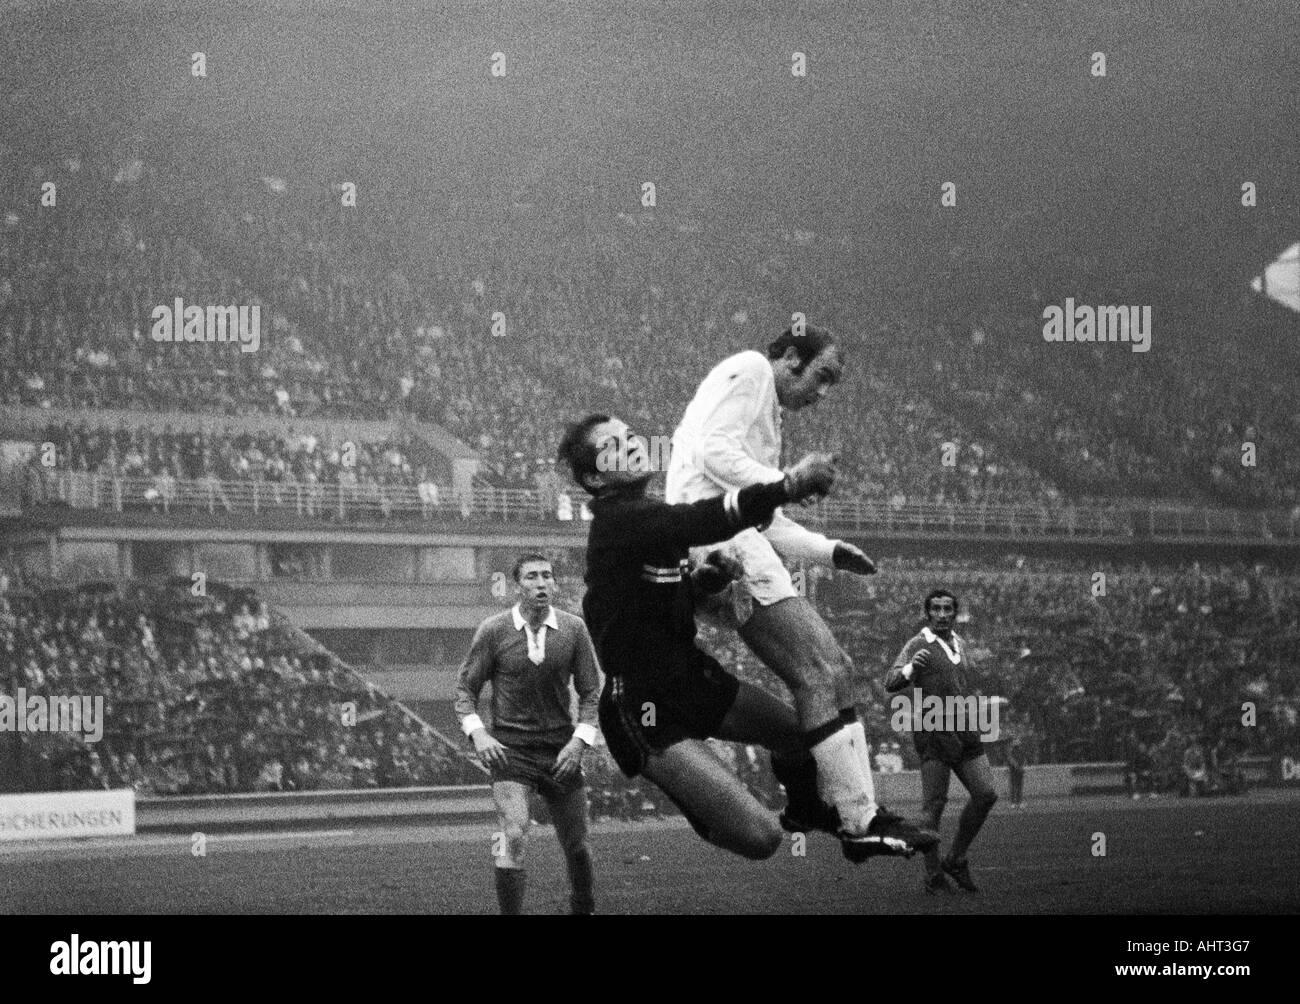 football, Bundesliga, 1970/1971, Wedau Stadium in Duisburg, MSV Duisburg versus Borussia Moenchengladbach 1:1, scene of the match, f.l.t.r. Kurt Rettkowski, keeper Volker Danner (both MSV), Horst Koeppel (MG), Djordje Pavlic (MSV) - Stock Image